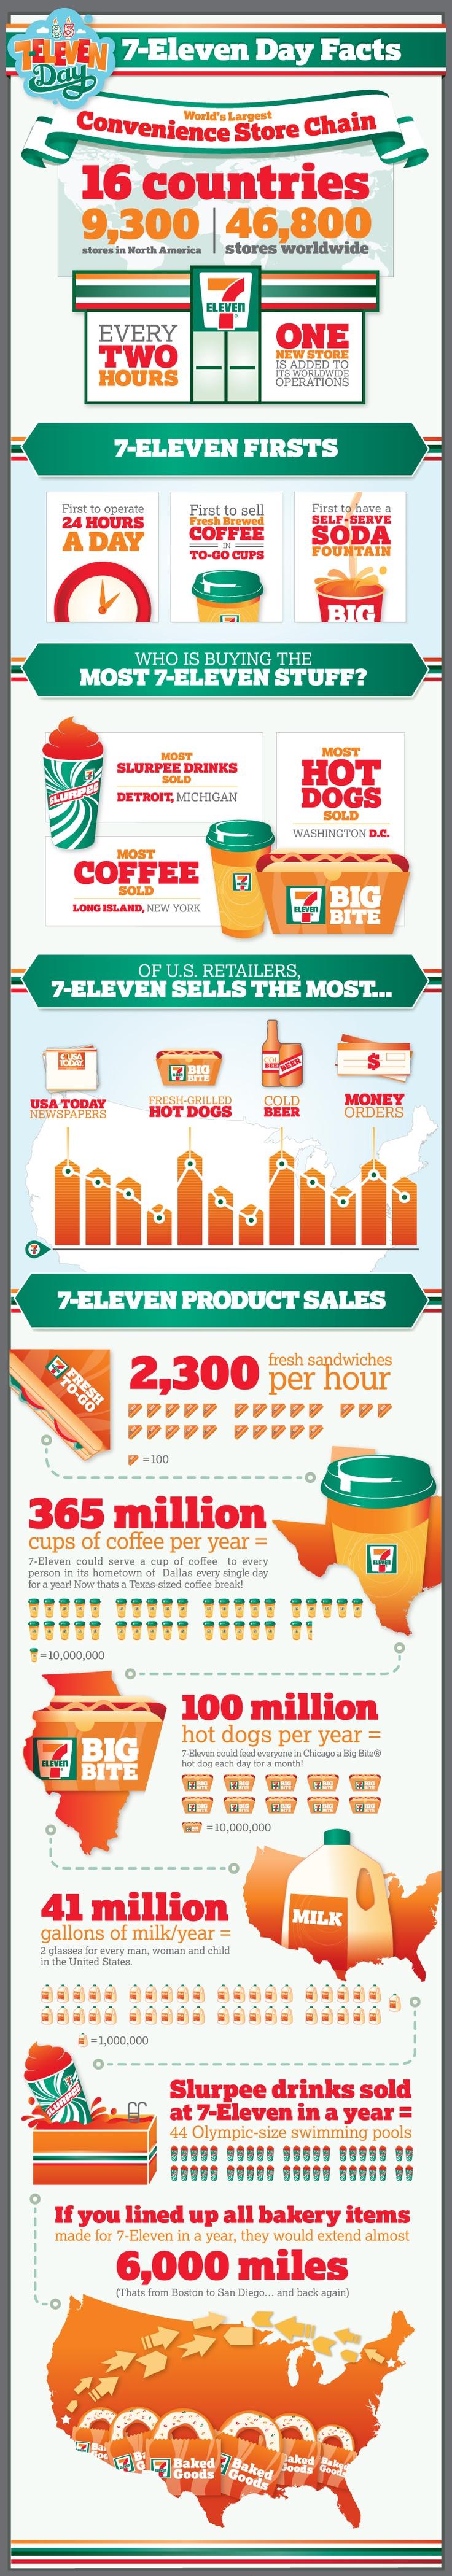 7-Eleven infographic I designed!